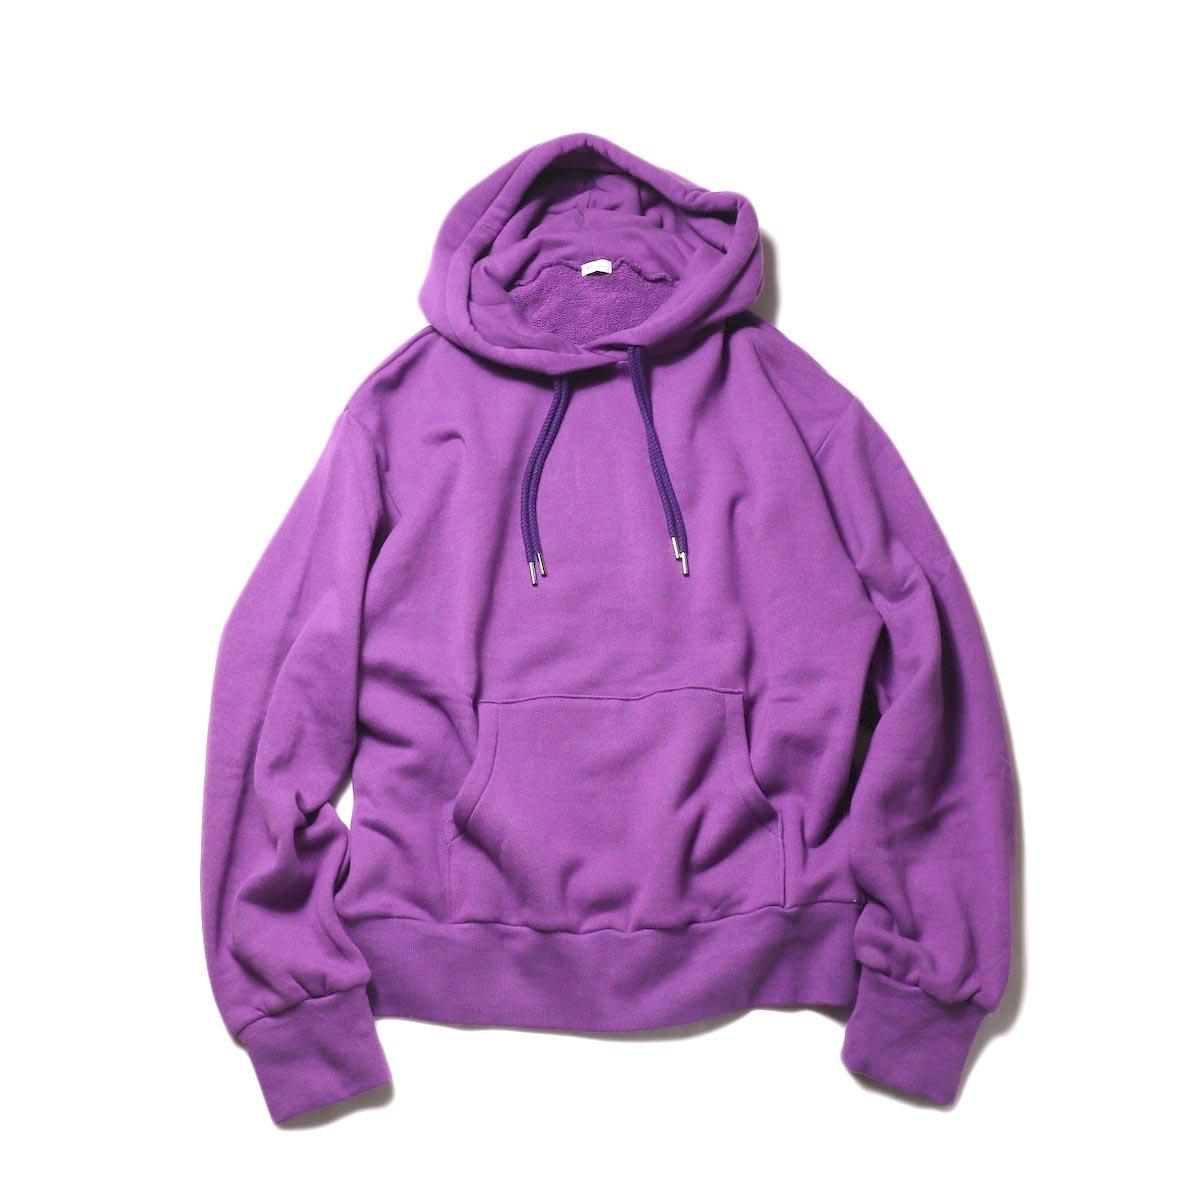 MY_ / SWEAT HOODIE (purple)